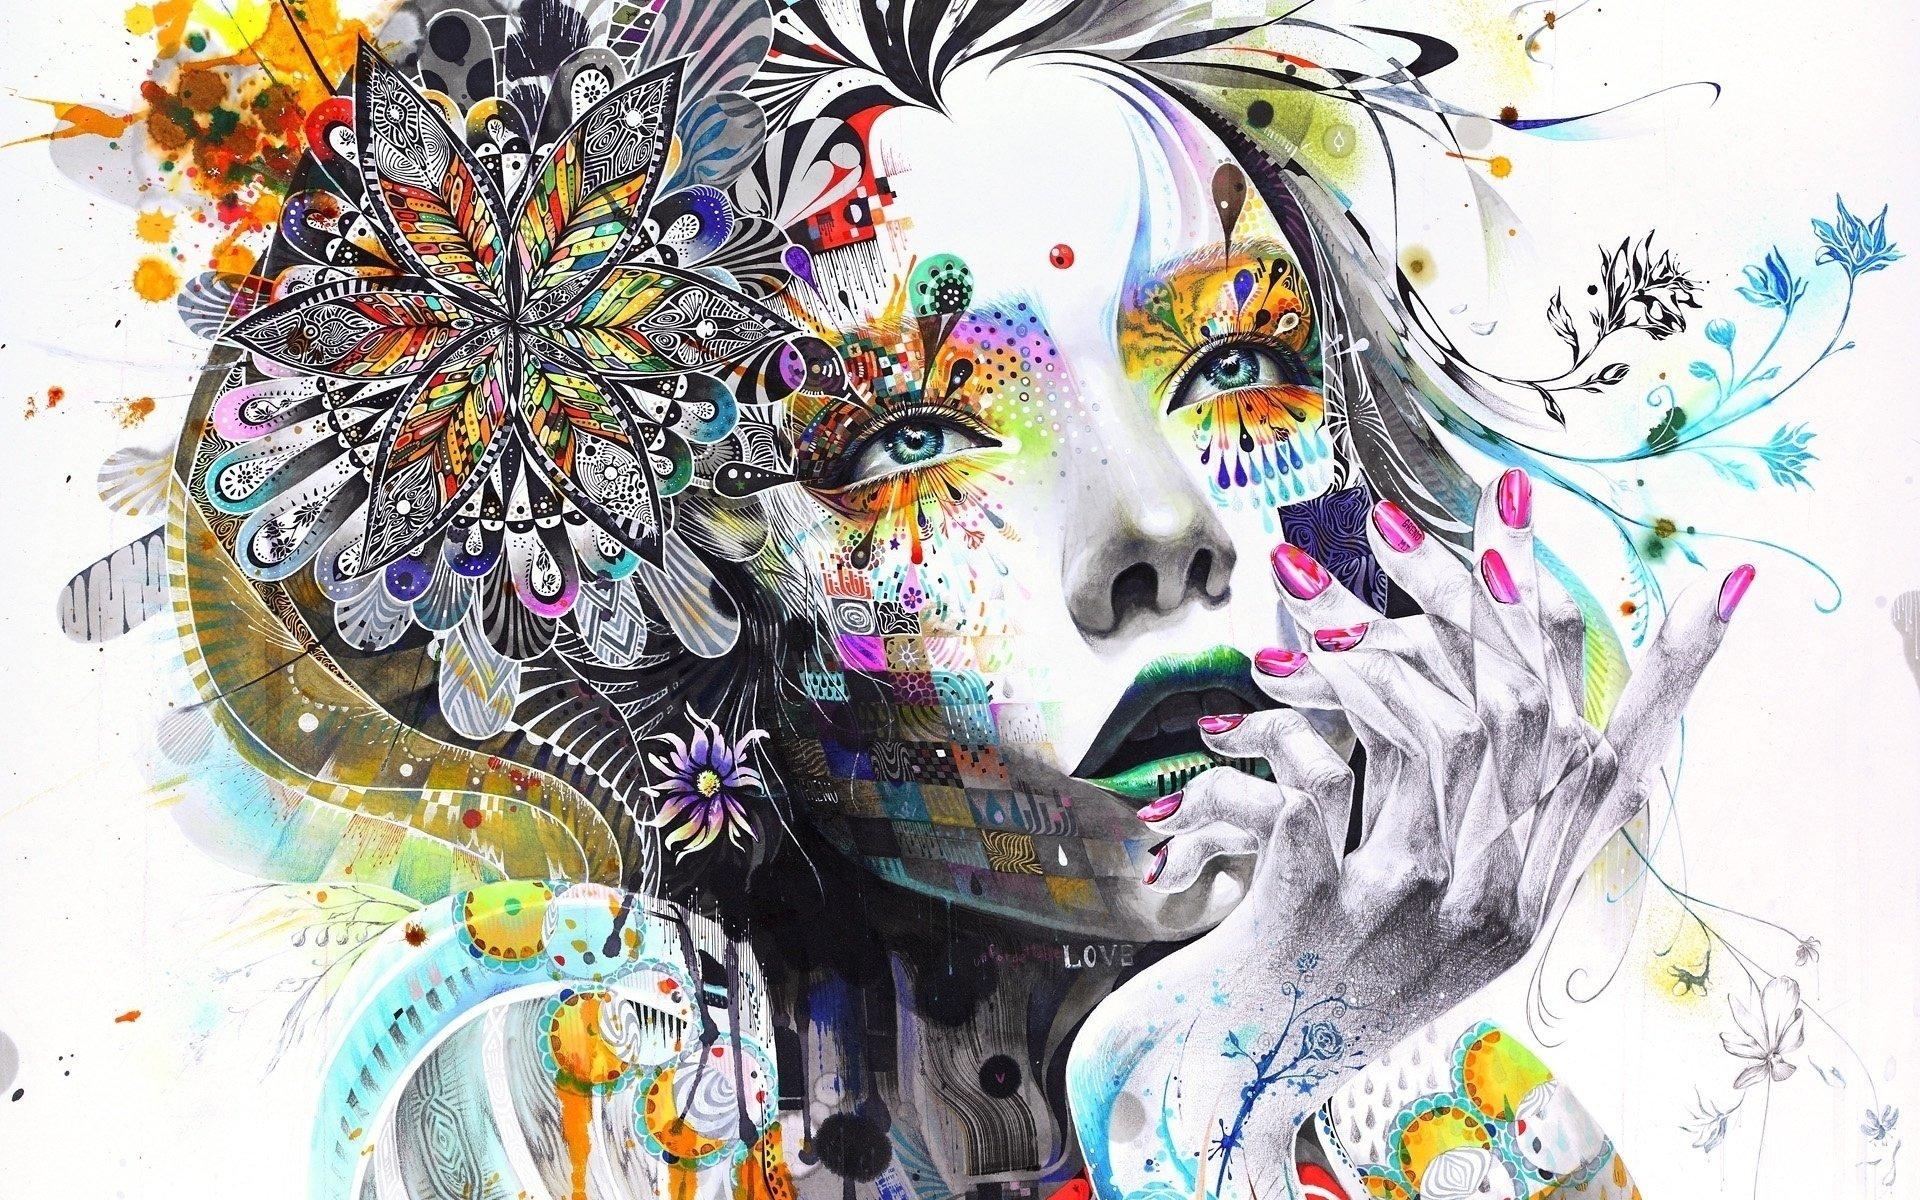 Креативность - понятие для творческих людей и технарей   креативный мозг